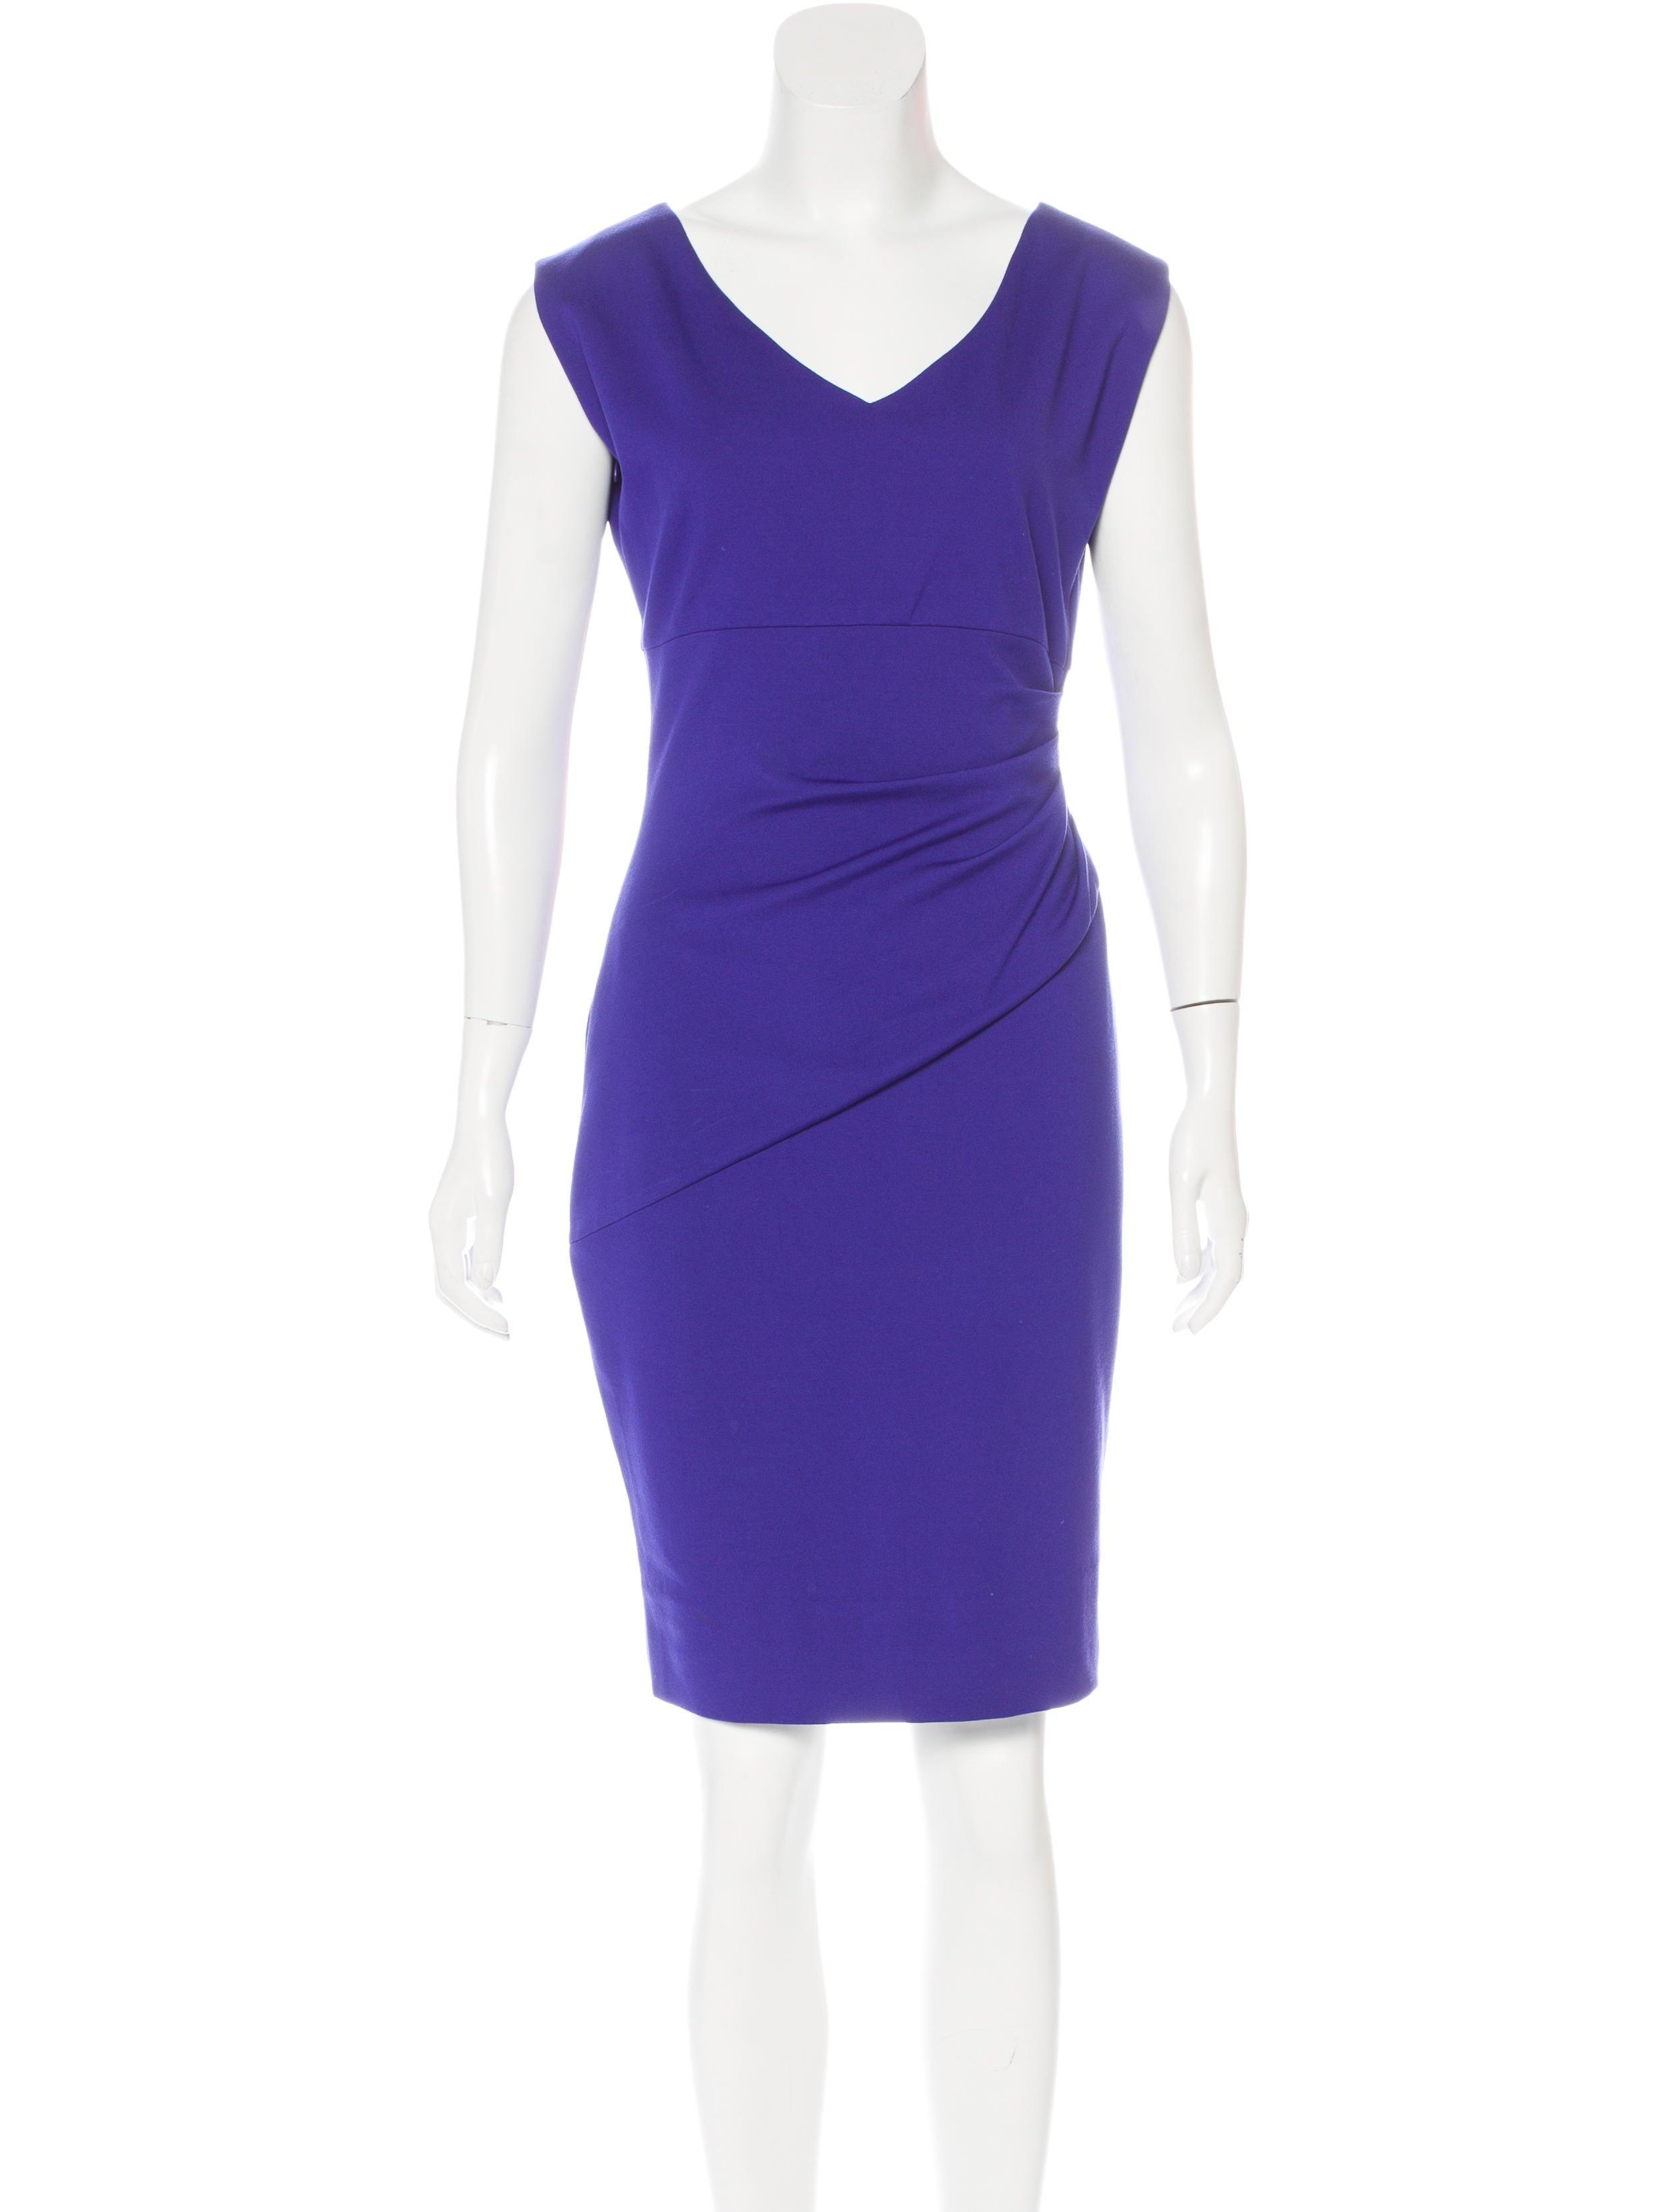 7c6896feba081 Diane von Furstenberg Bevin Sheath Dress - Clothing - WDI89662